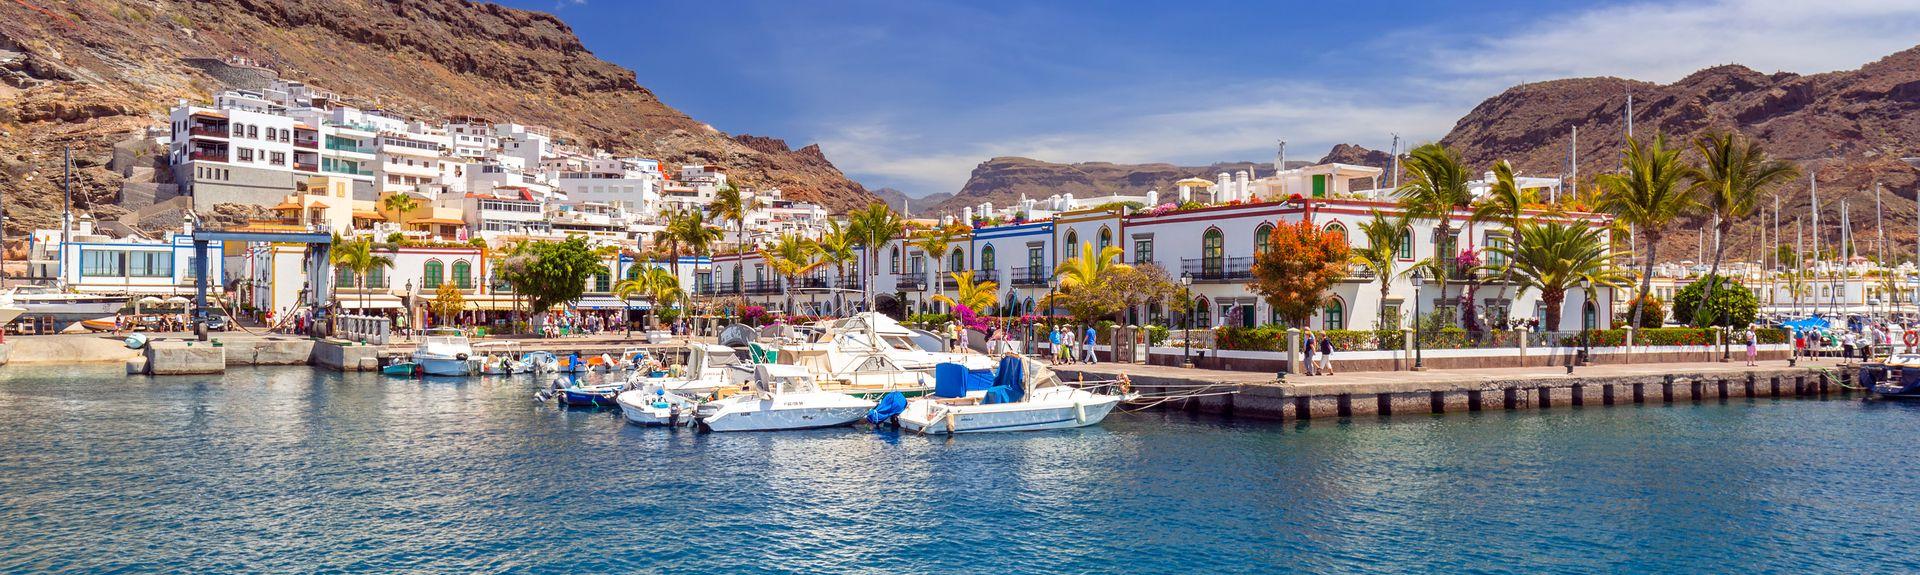 Gran Canaria Es Holiday Lettings Villas More Homeaway